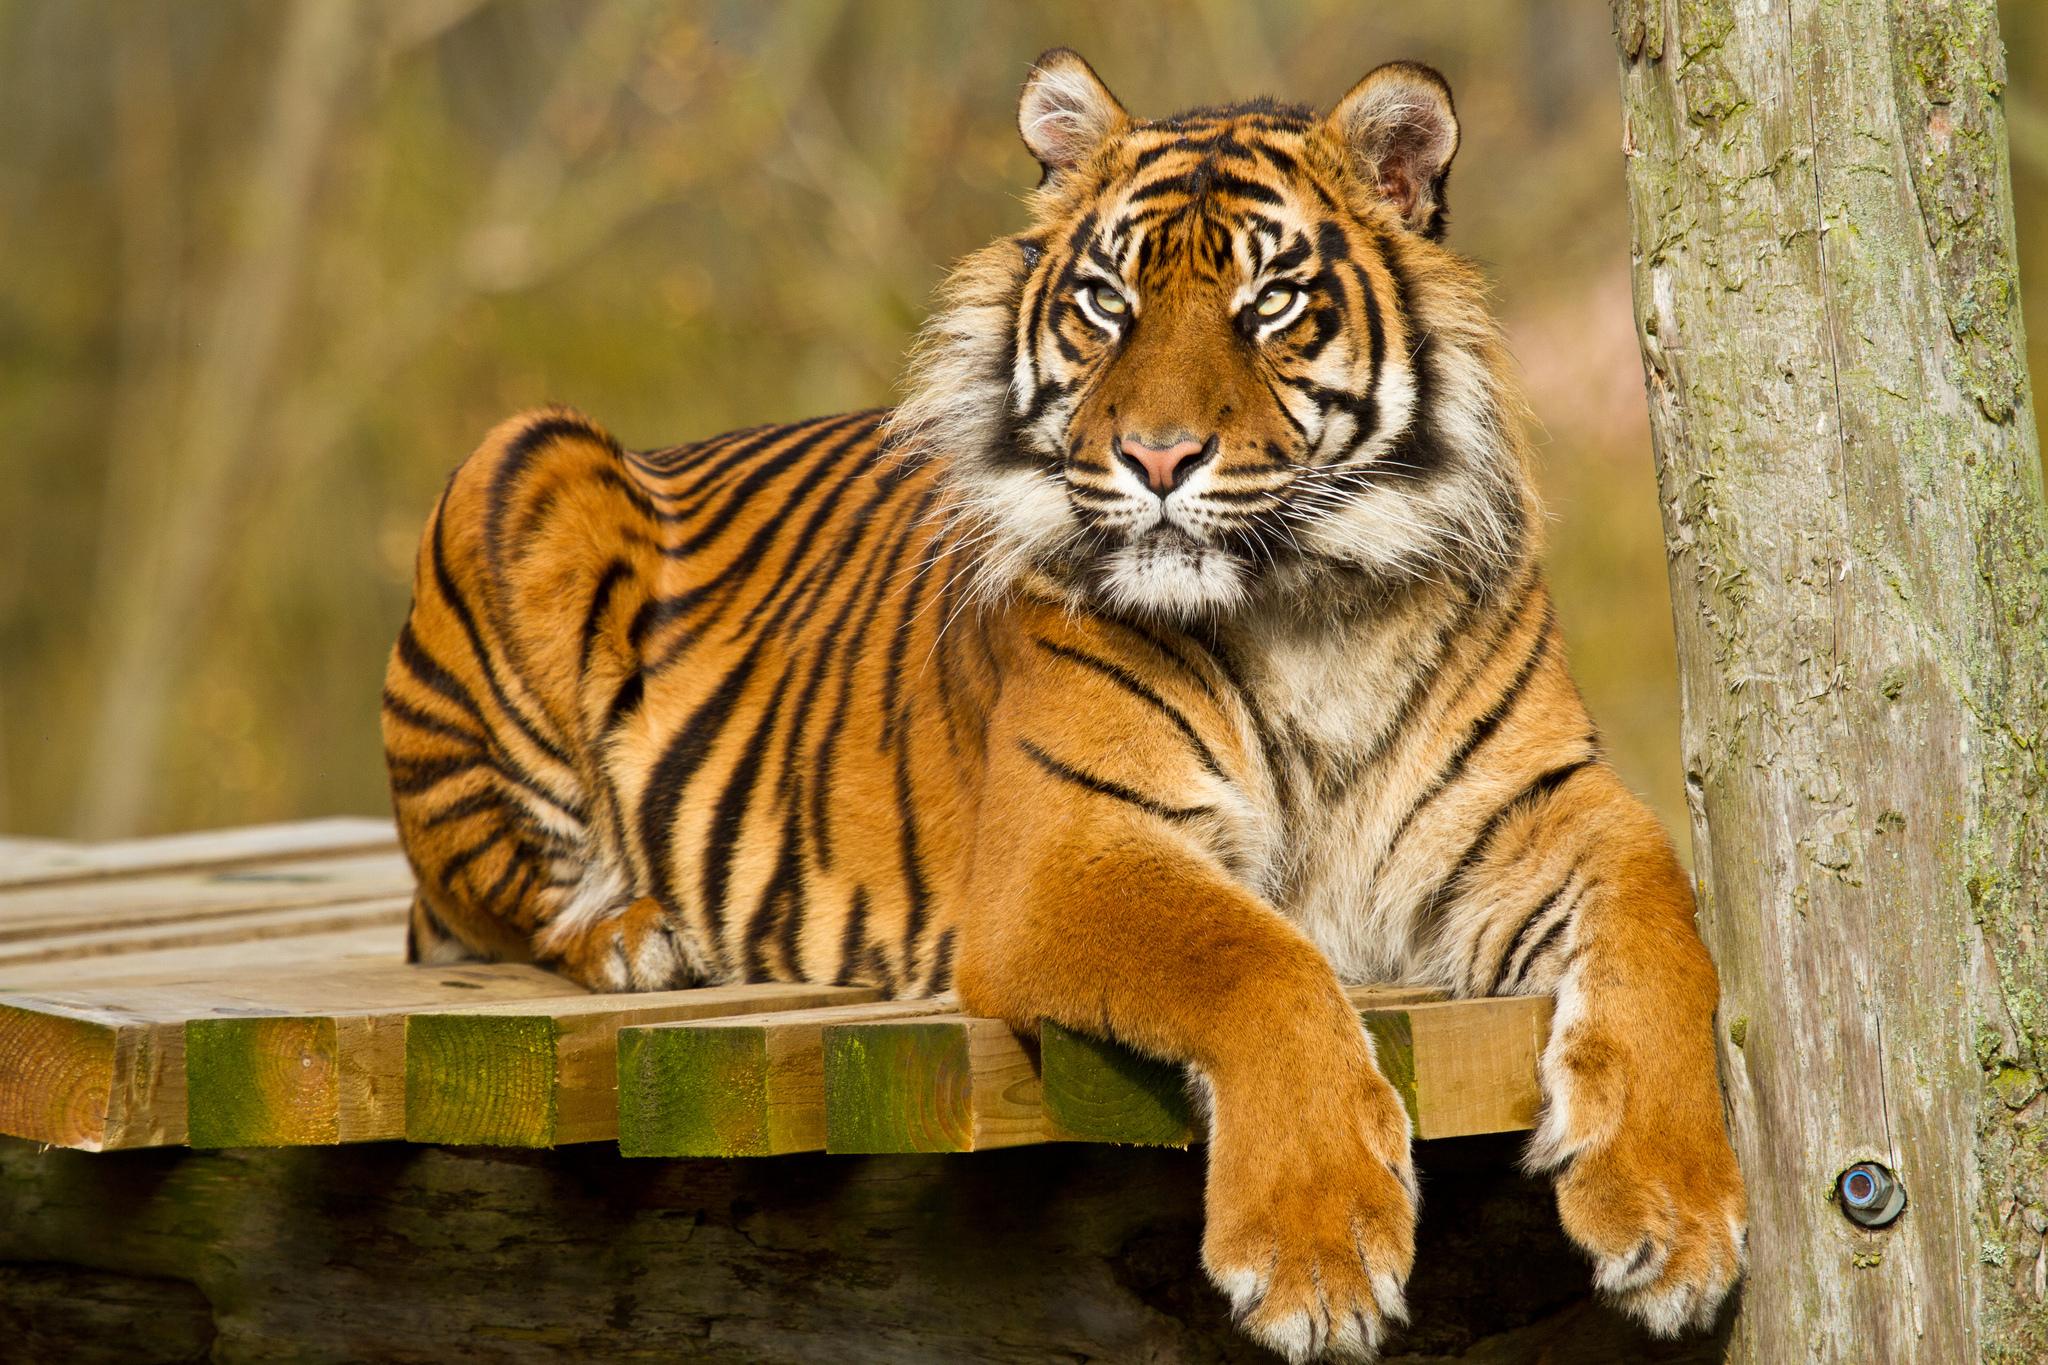 тигр картинки фотографии задумали свадьбу